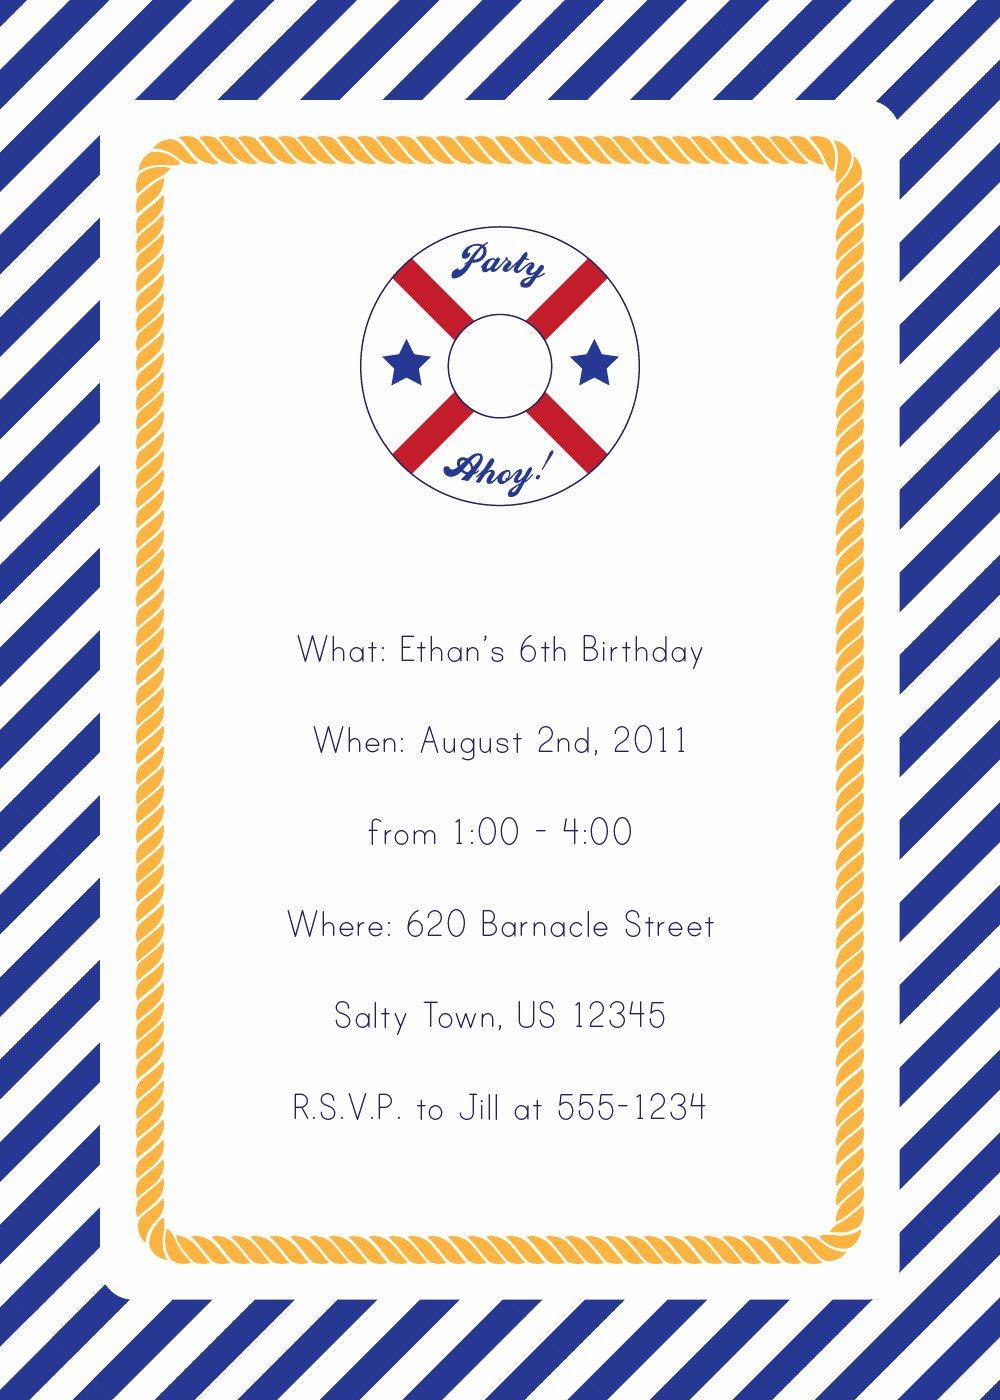 Nautical Invitation Template Free Awesome 40th Birthday Ideas Nautical Birthday Invitation Templates